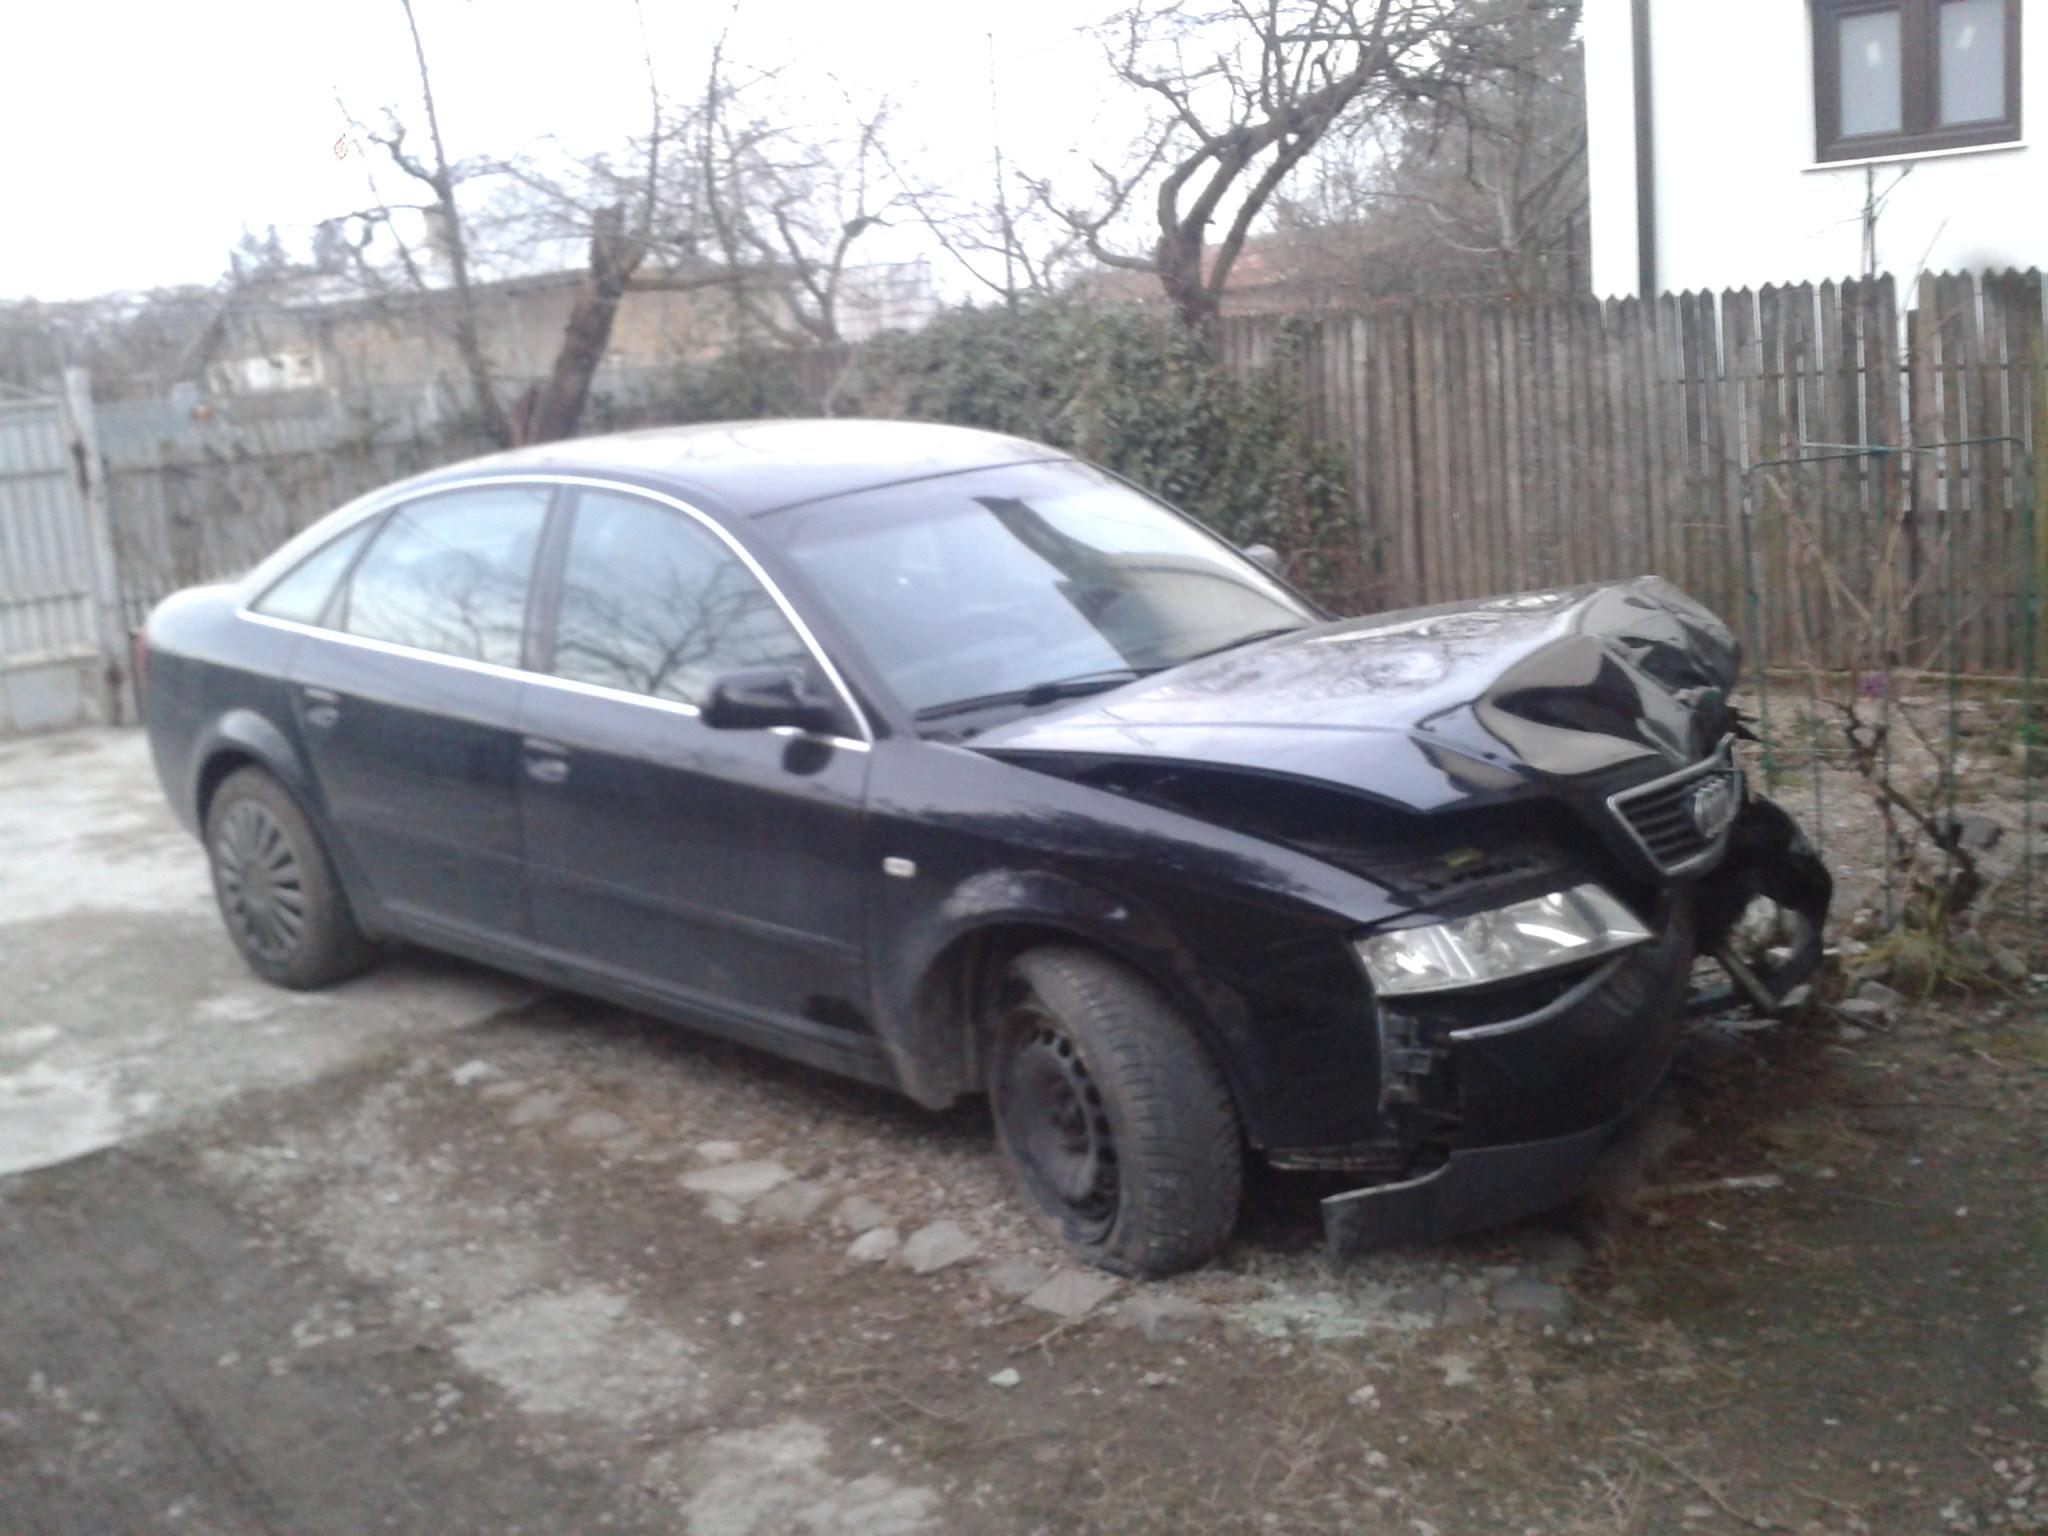 Audi A6 avariat 2001 Diesel Berlina - 09 Martie 2013 - Poza 2